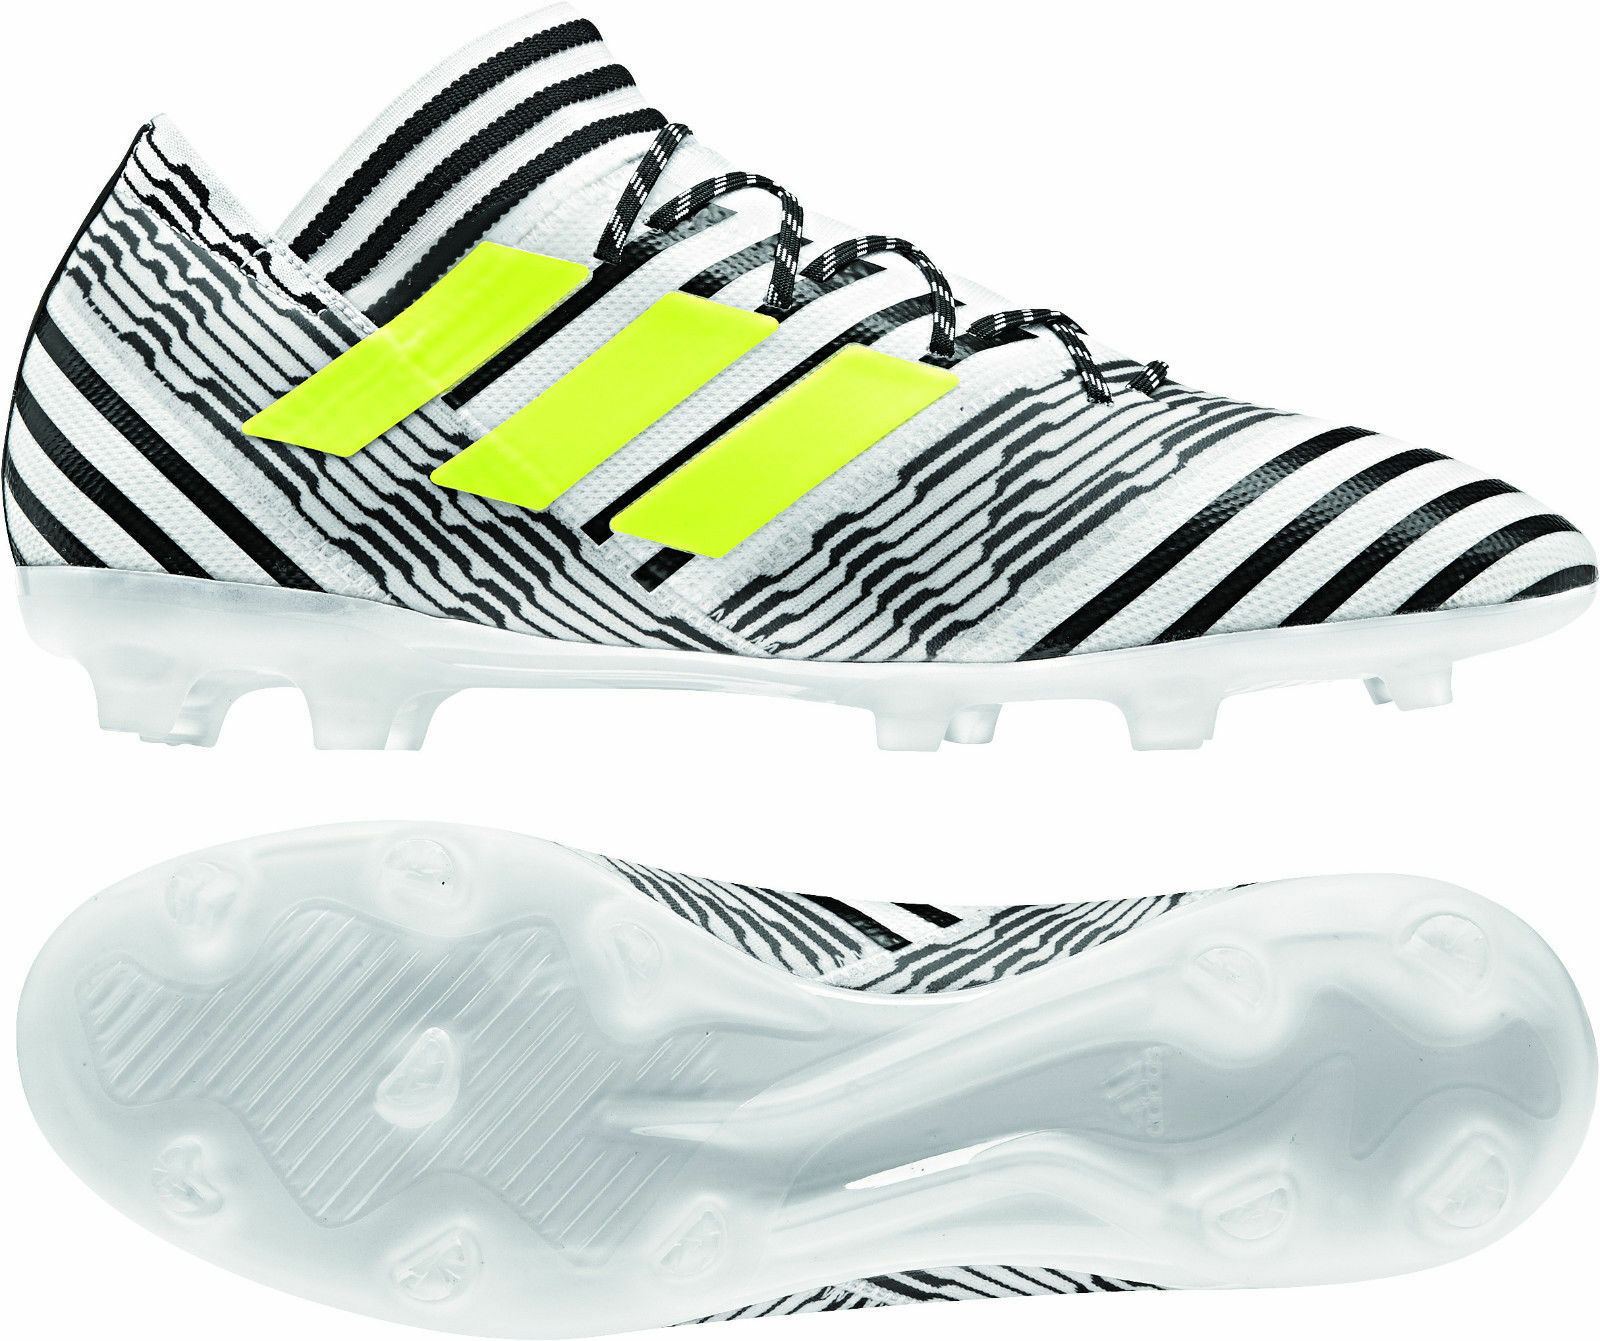 Adidas nemeziz 17.2 FG agilitymesh Soquí s80592 blancoo-negro-amarillo